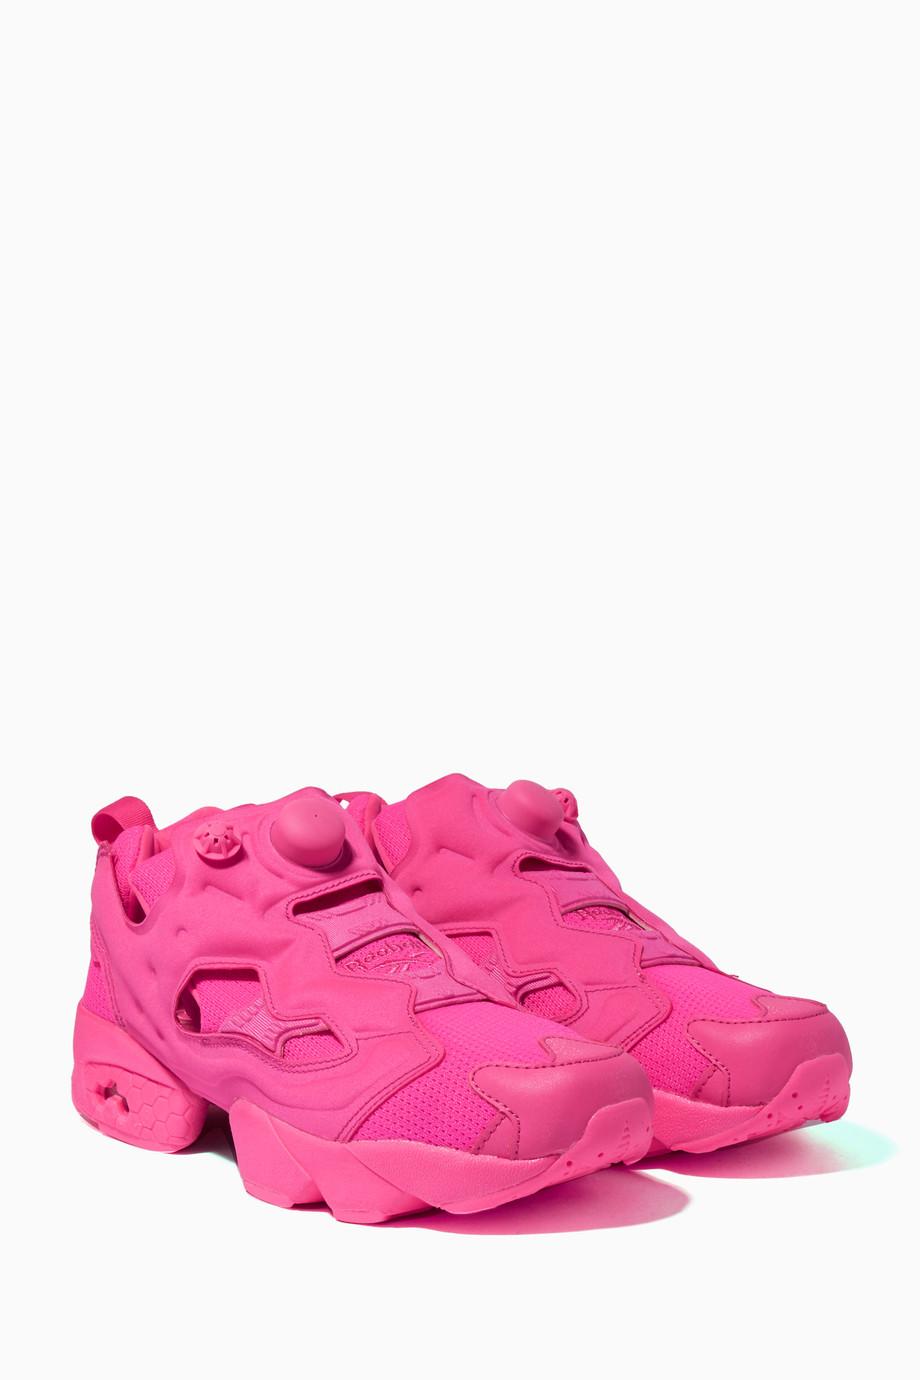 4caa7347f تسوق حذاء سنيكرز إنستابامب فيوري فيتيمنتس X ريبوك وردي فاقع فيتيمنتس ...